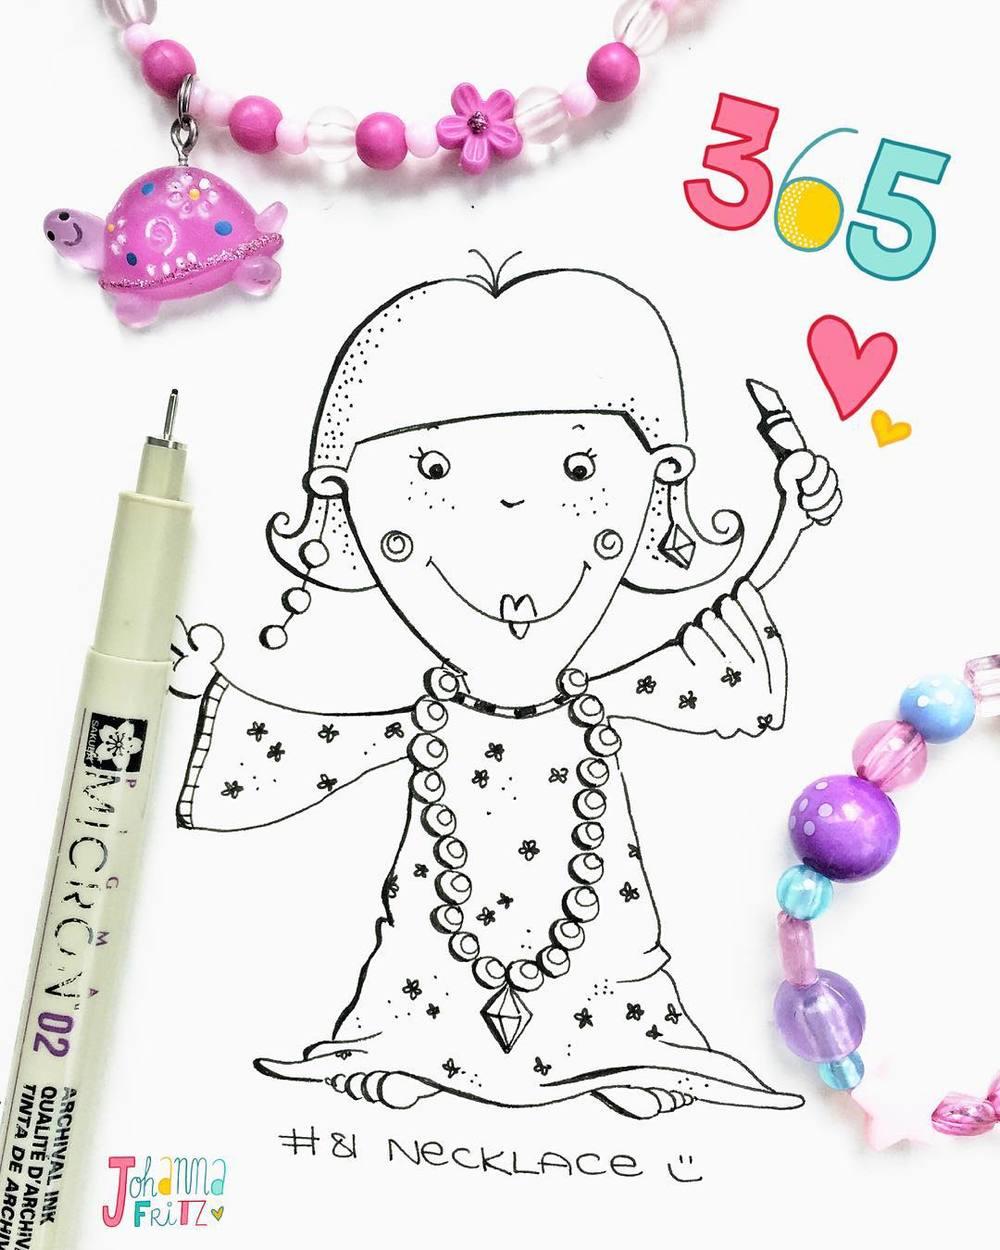 Doodle_81365_Necklace___365doodleswithjohannafritz___.jpg